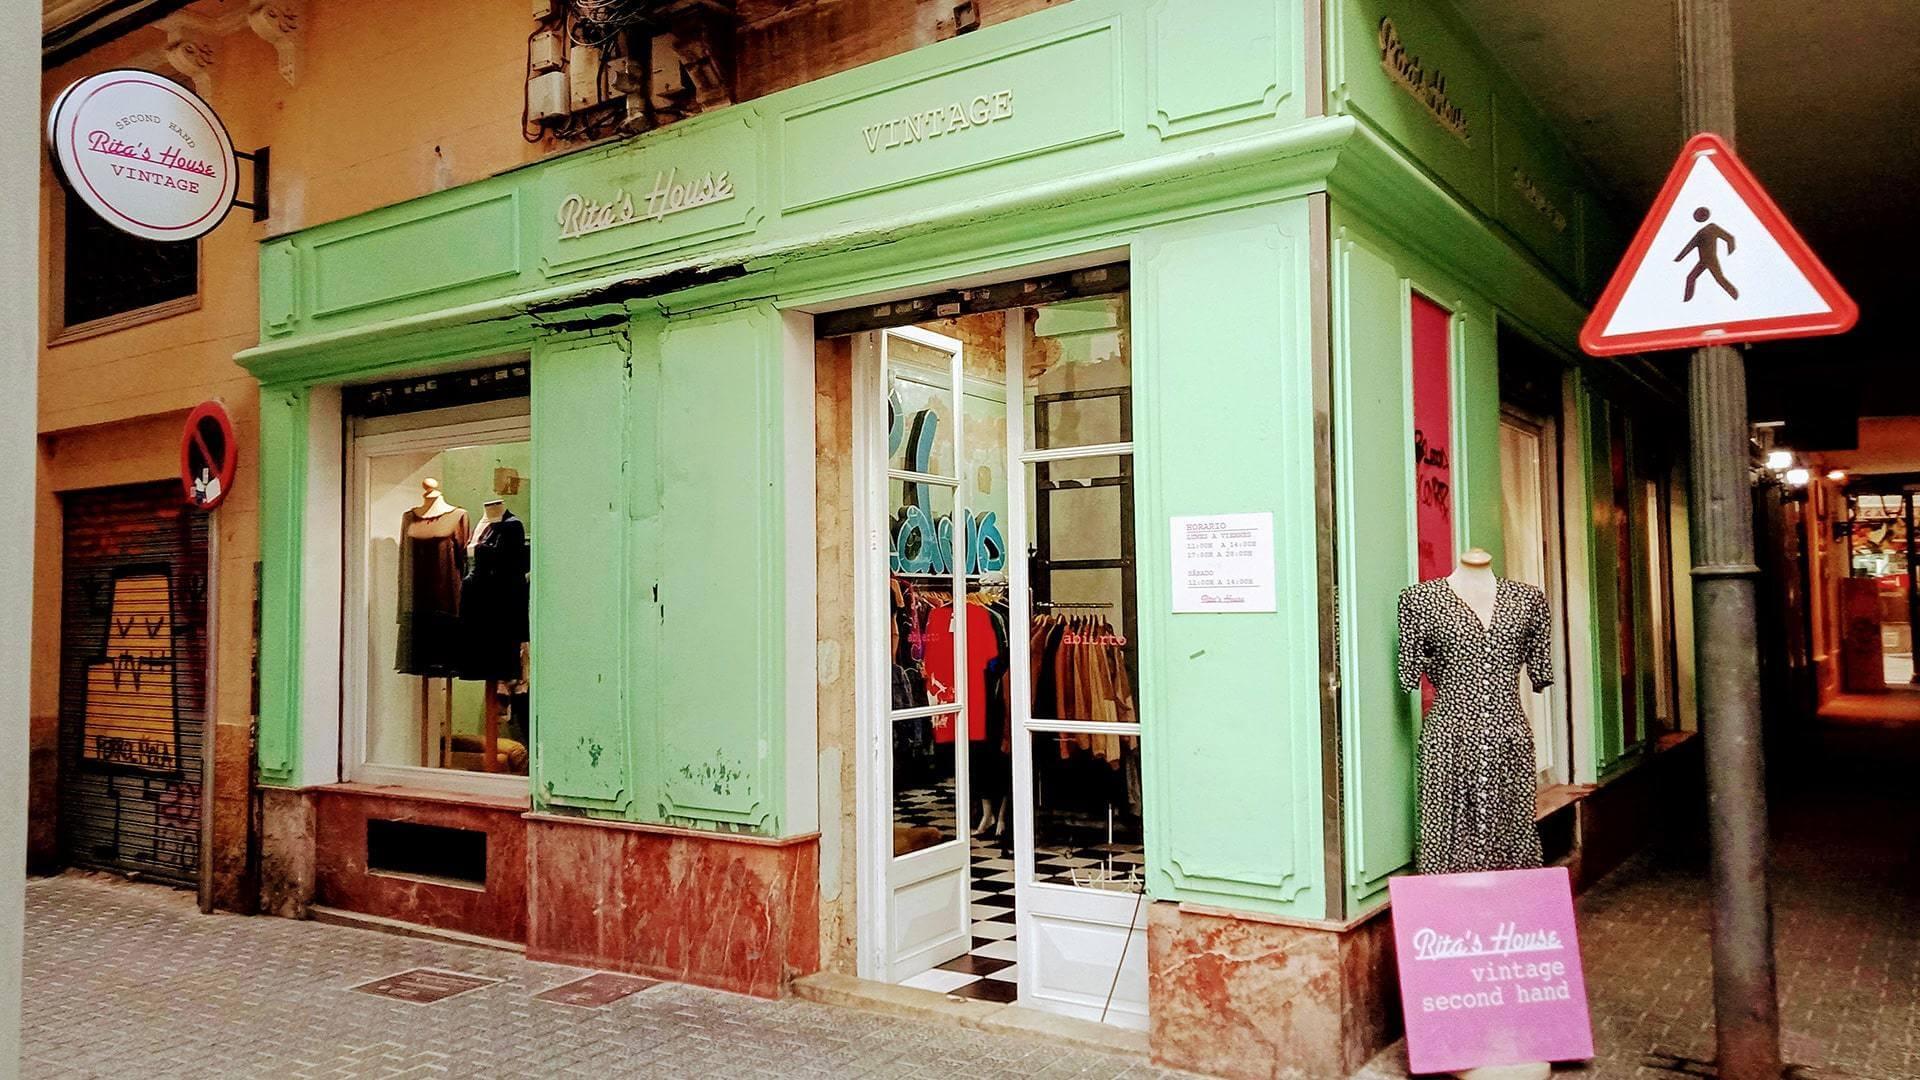 Ritas house second hand store Mallorca min